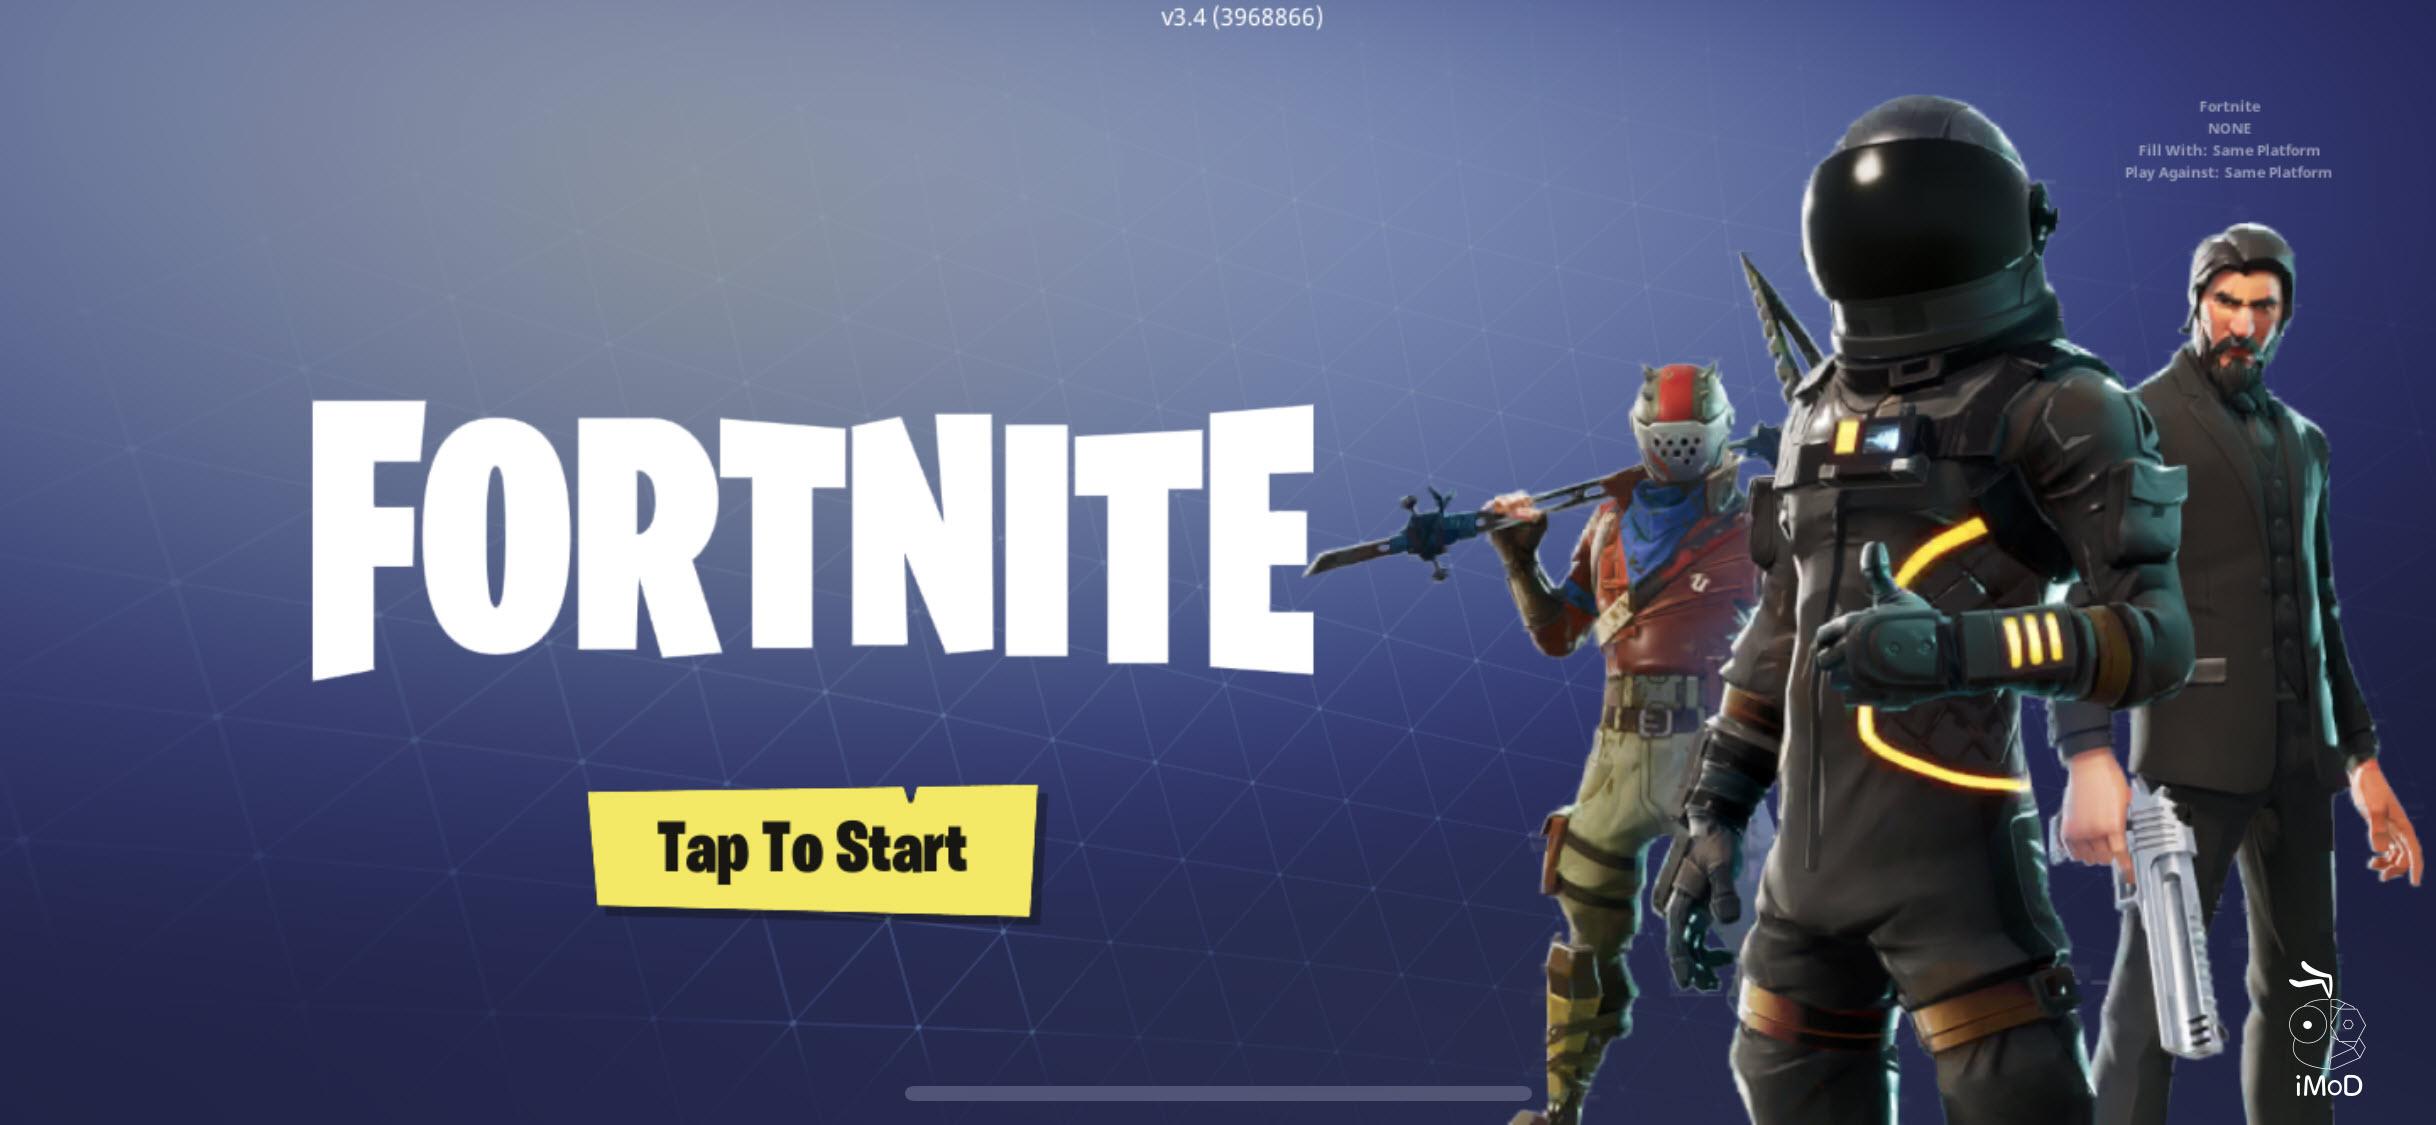 Fortnite Ios Released 003